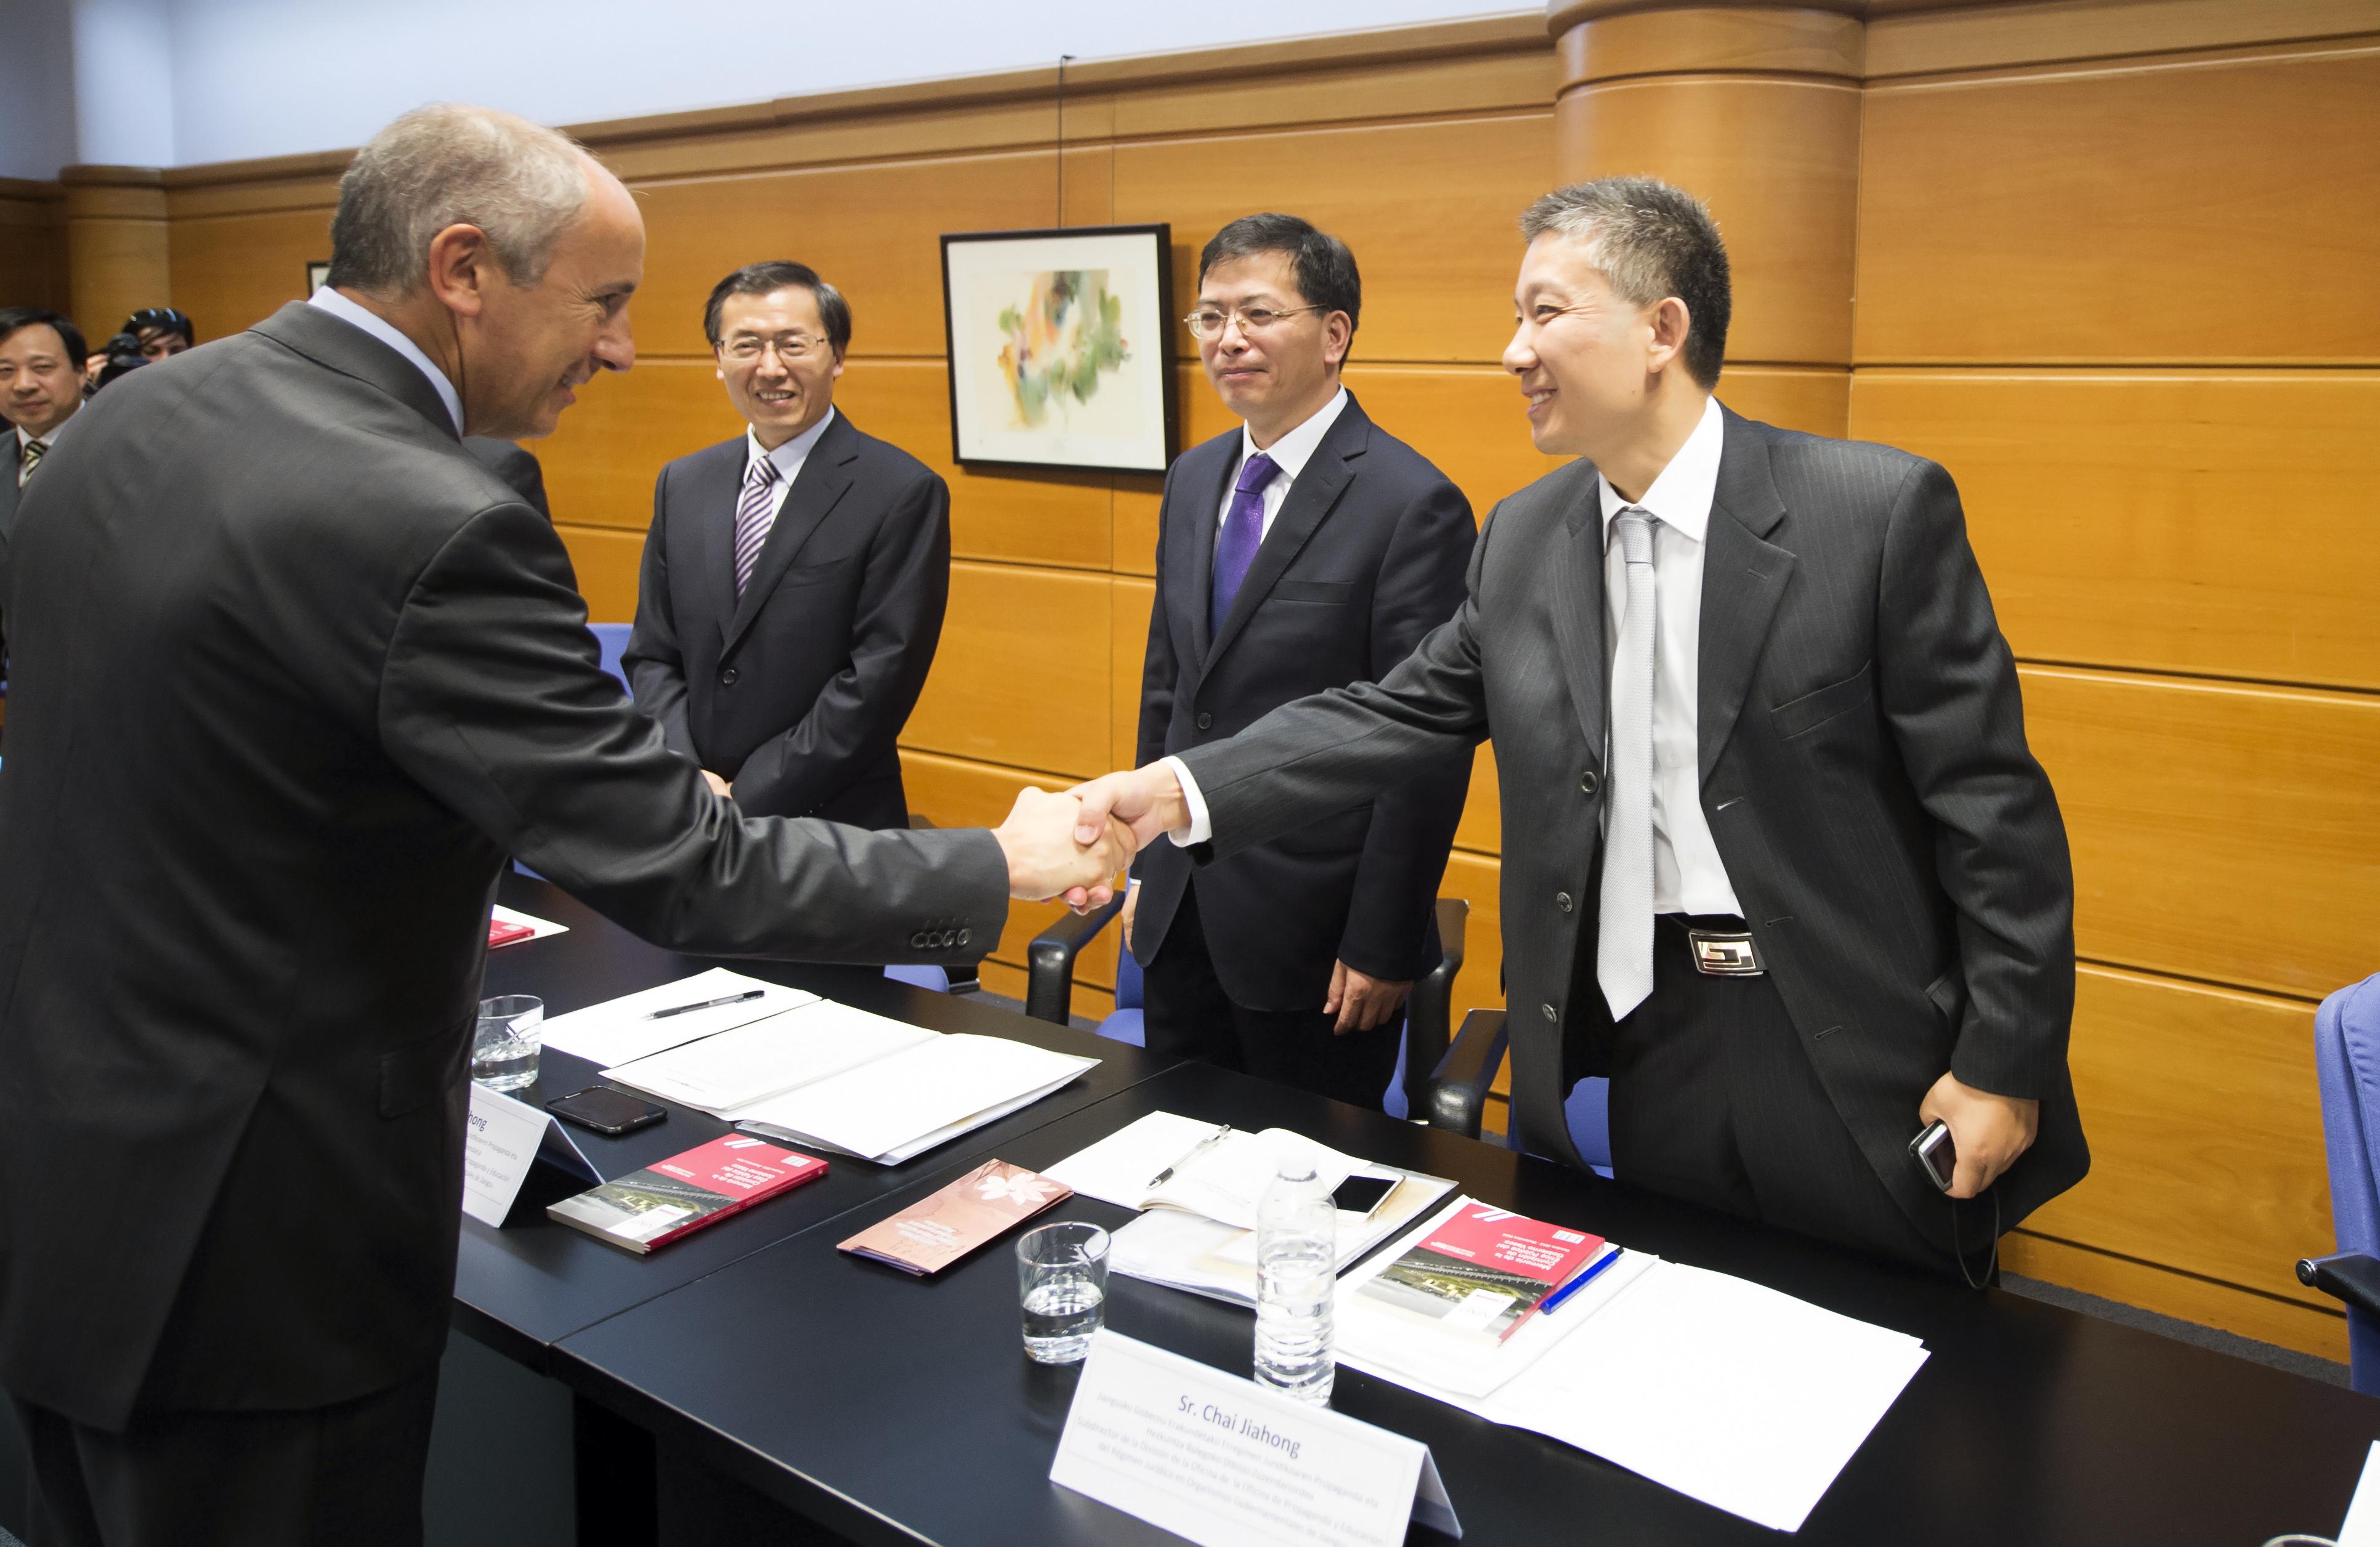 2015_09_09_erkoreka_delegacion_china_05.jpg